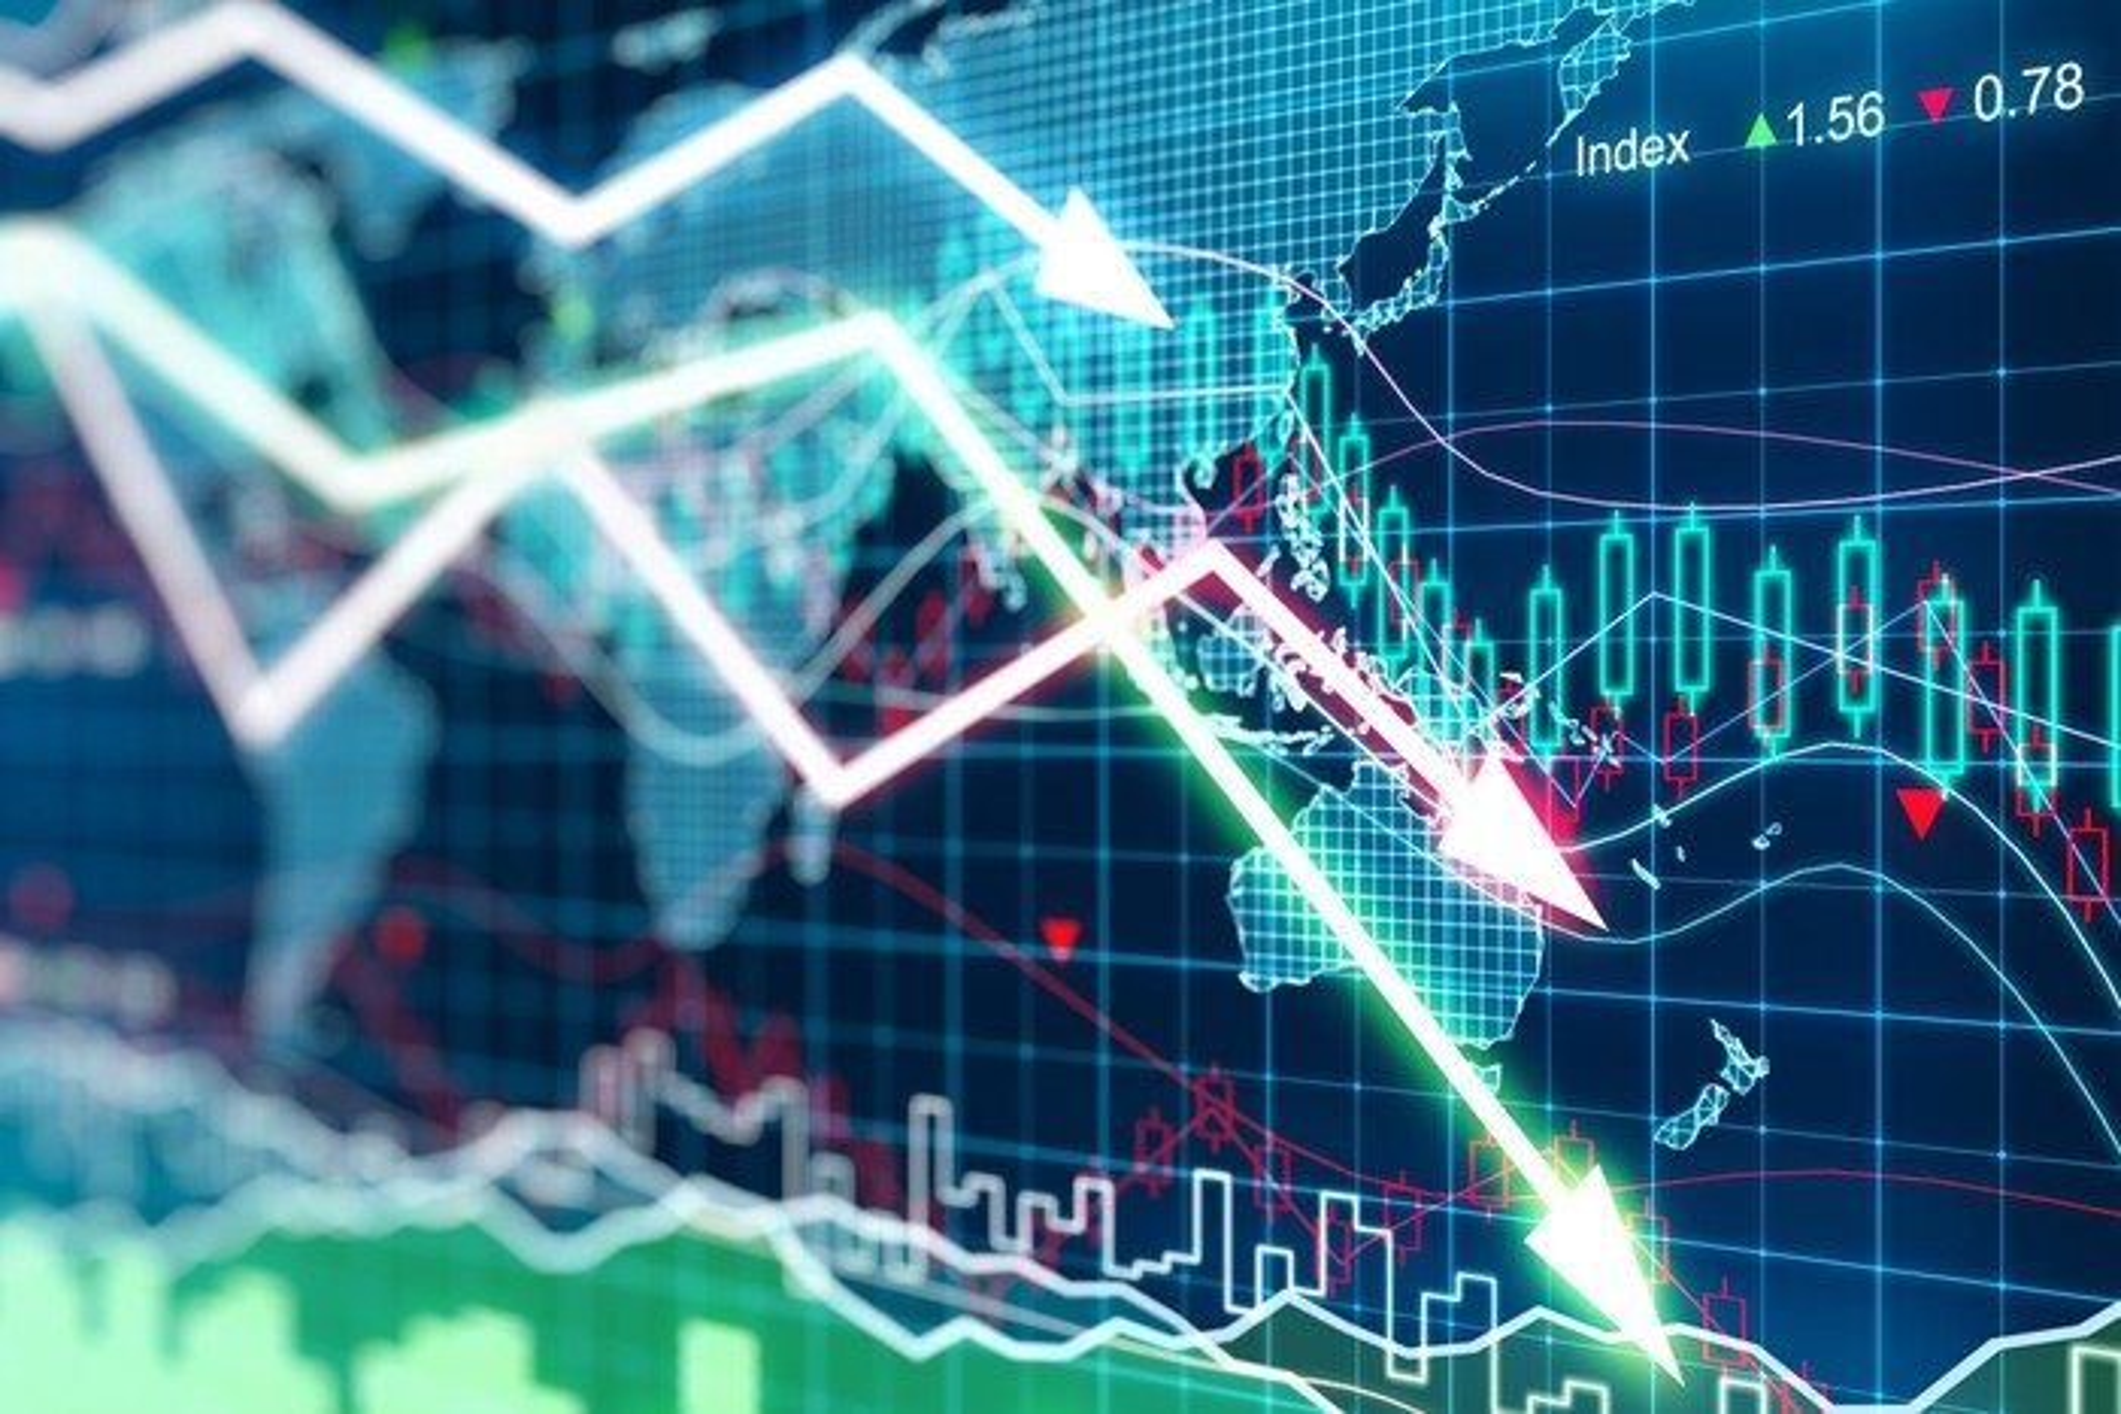 Arrows point downward on a digital financial chart.